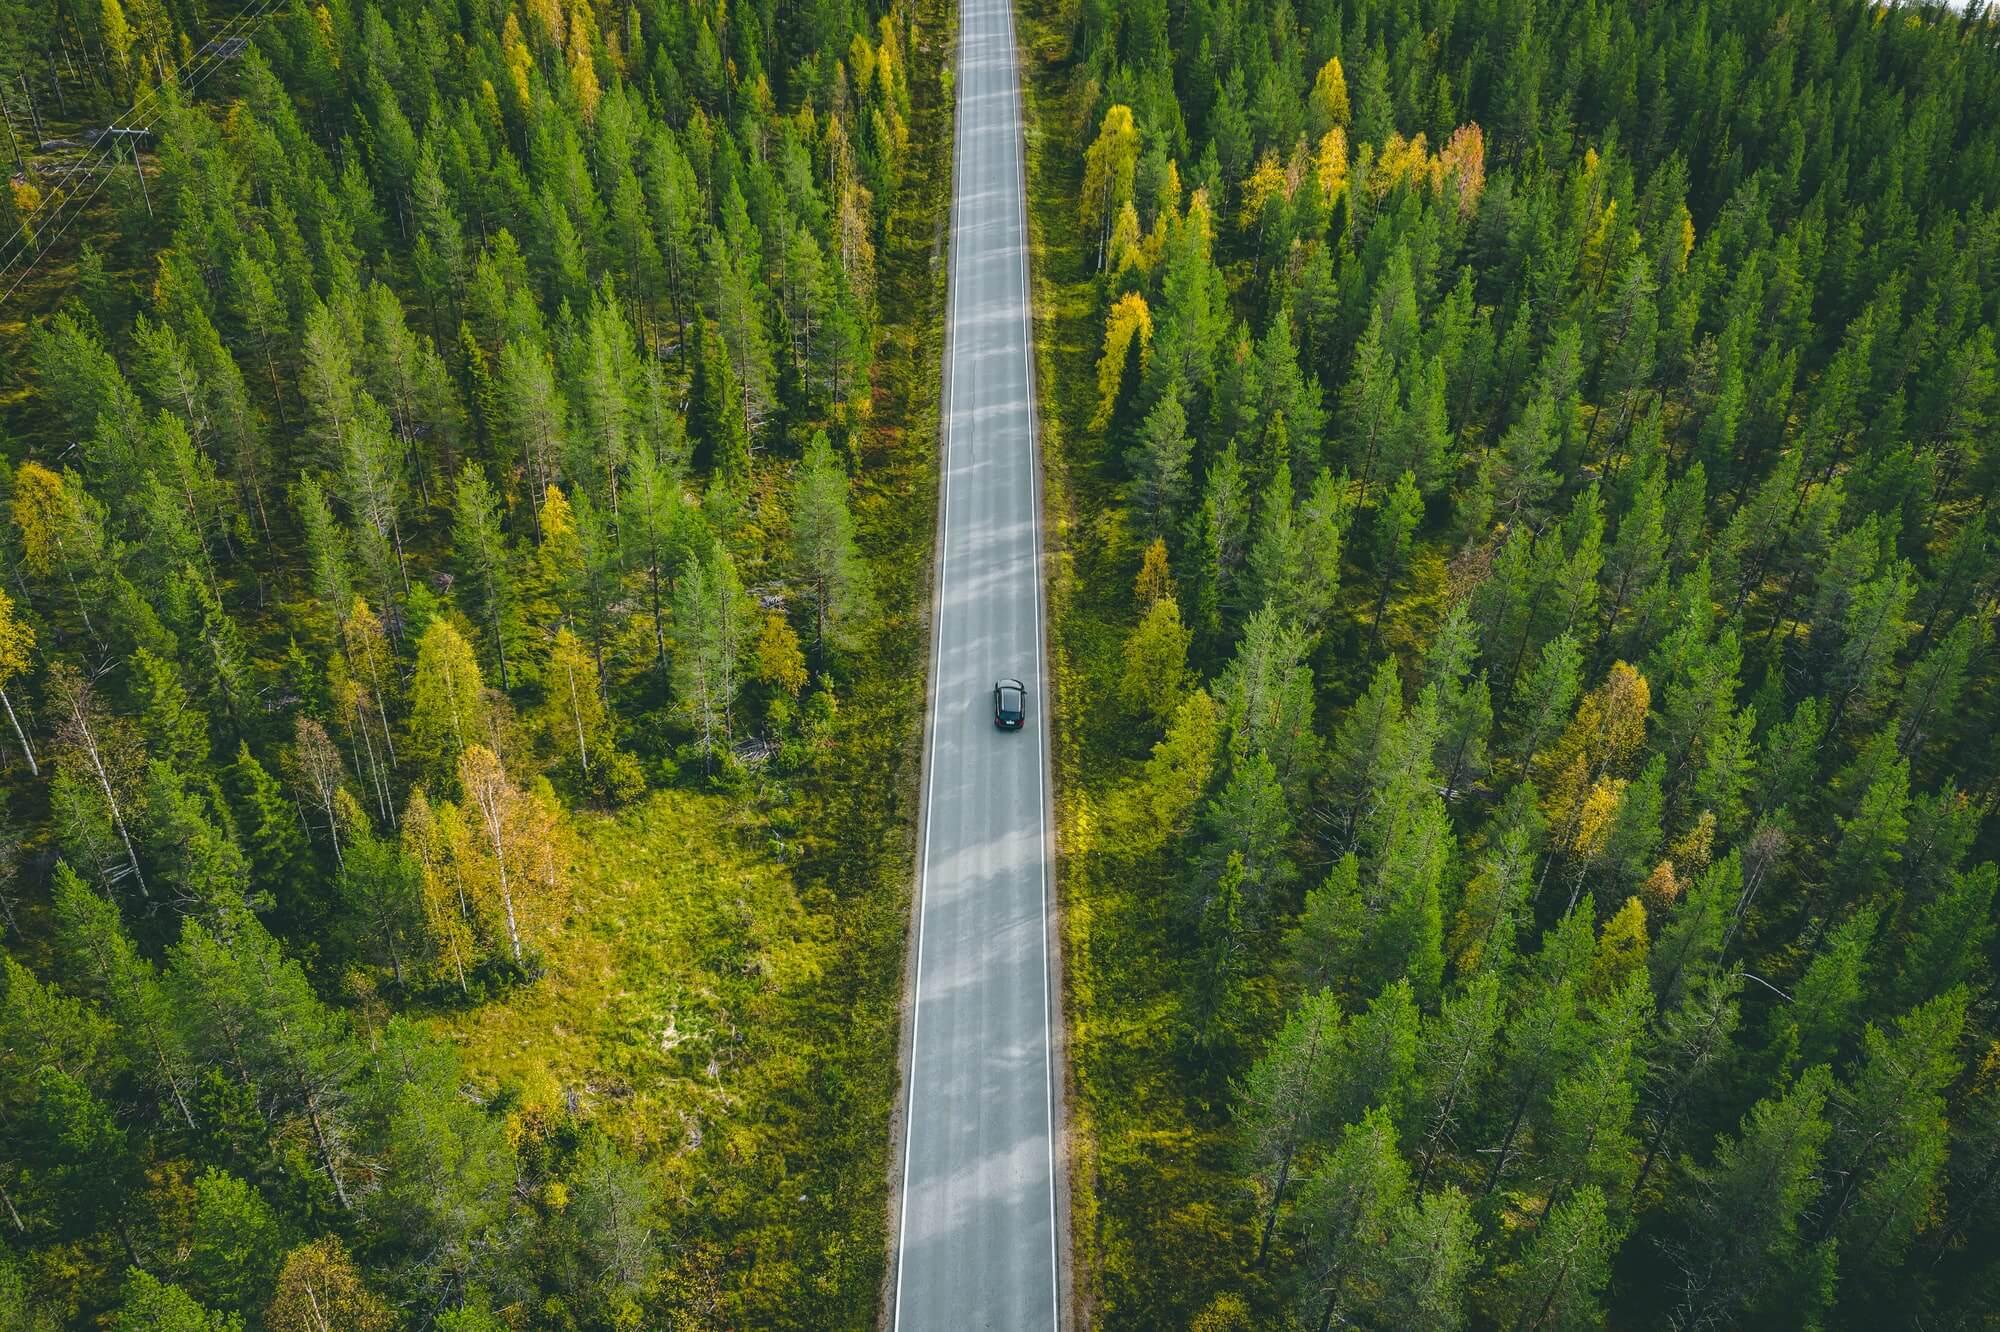 Aerial view of car on a road in green forest Miljöpåverkning taxilandskrona620